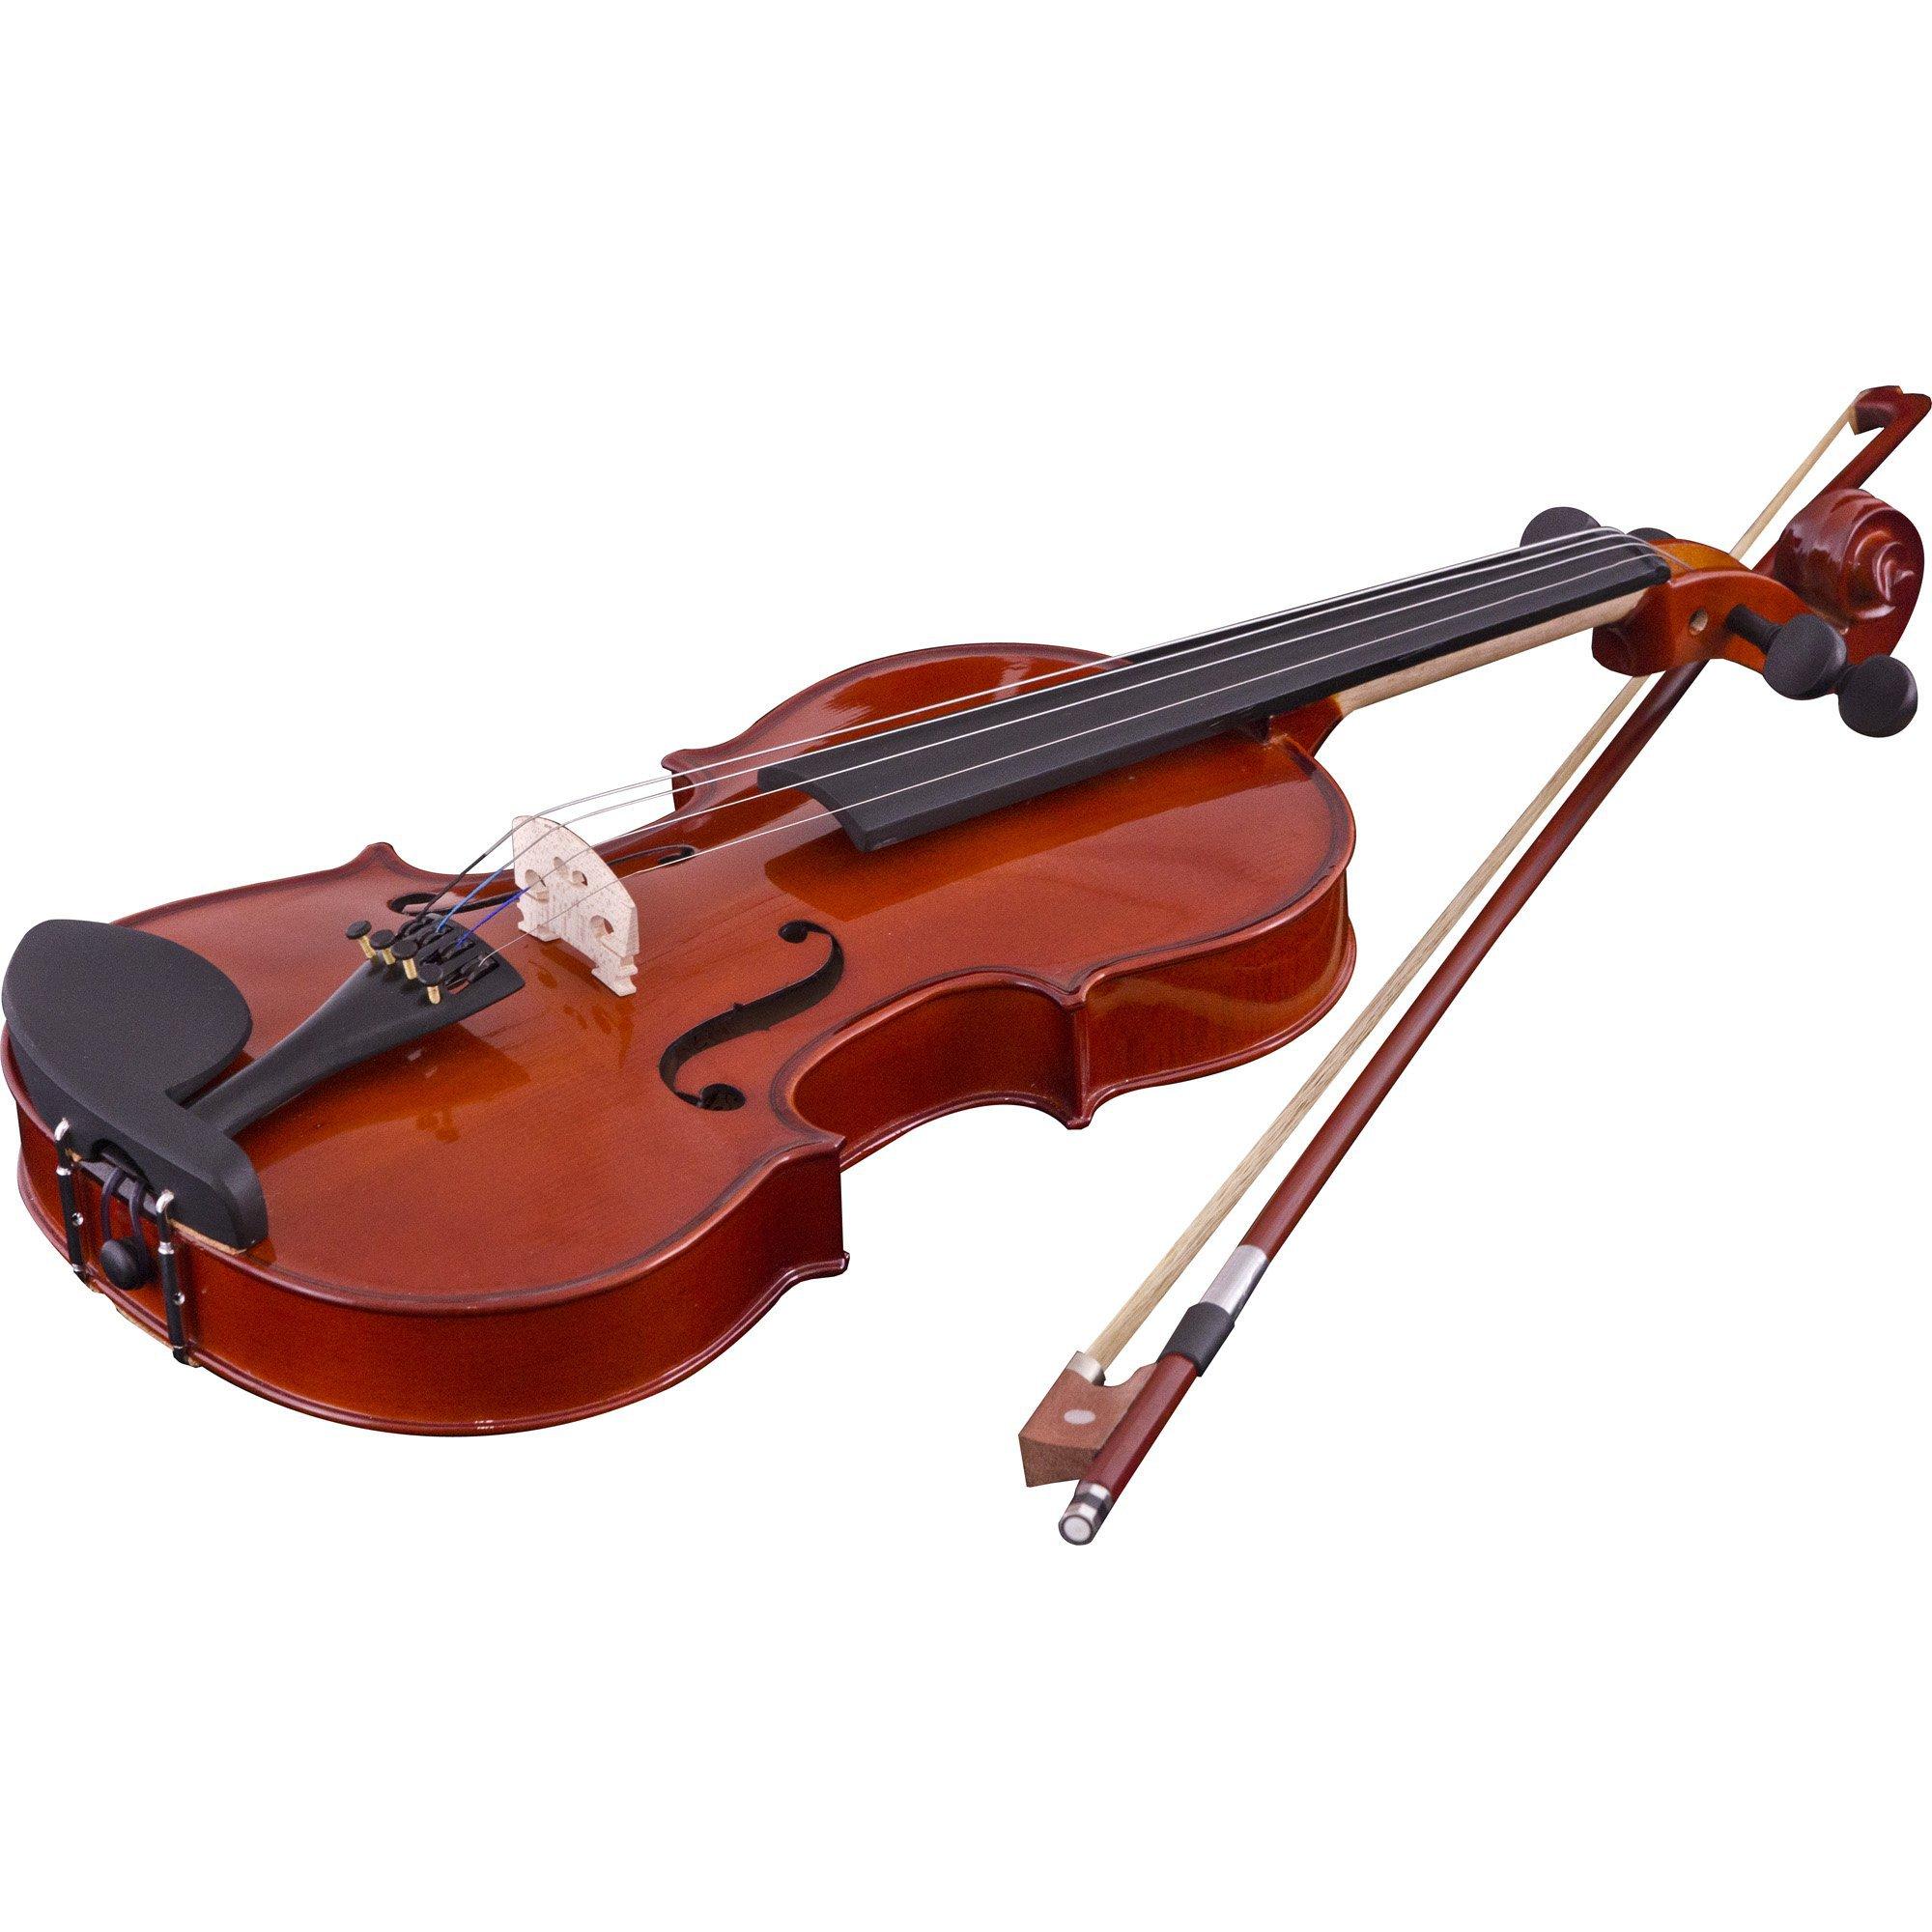 violino 4 4 va 10 oportunidade natural harmonics 42888 2000 181310